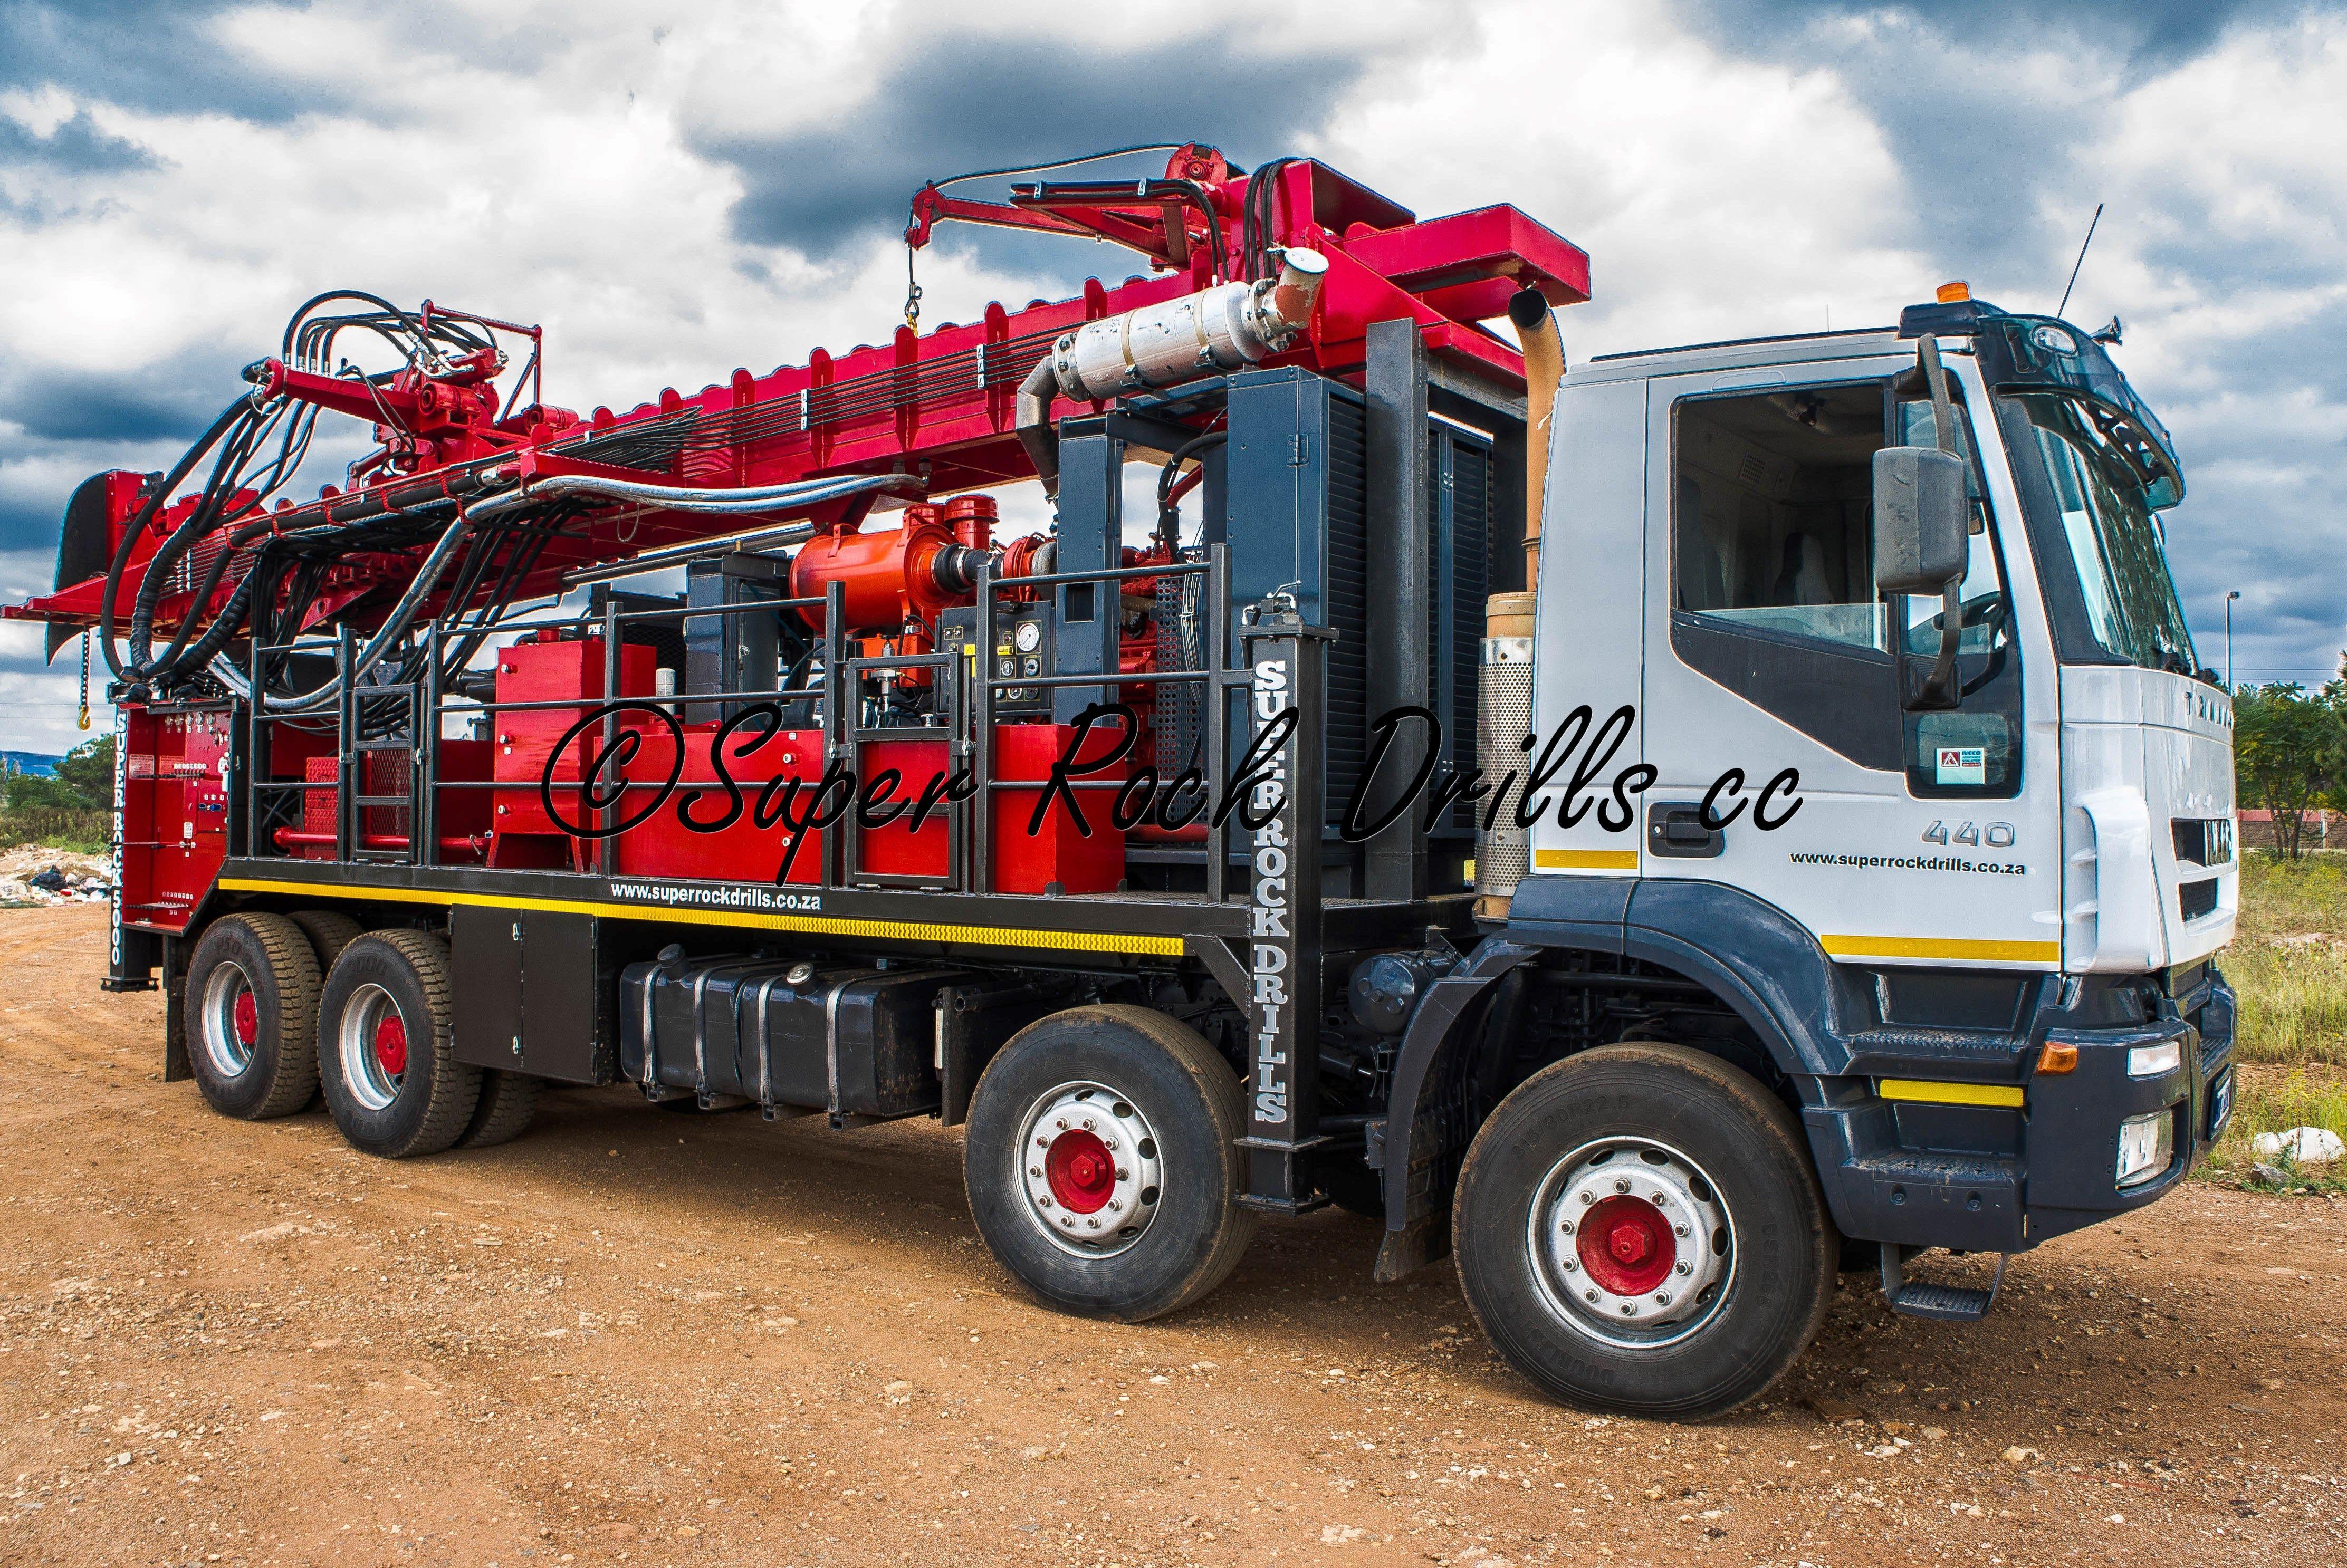 A Super Rock 5000 Rc Drill Rig Drilling Rig Drilling Machine Drill